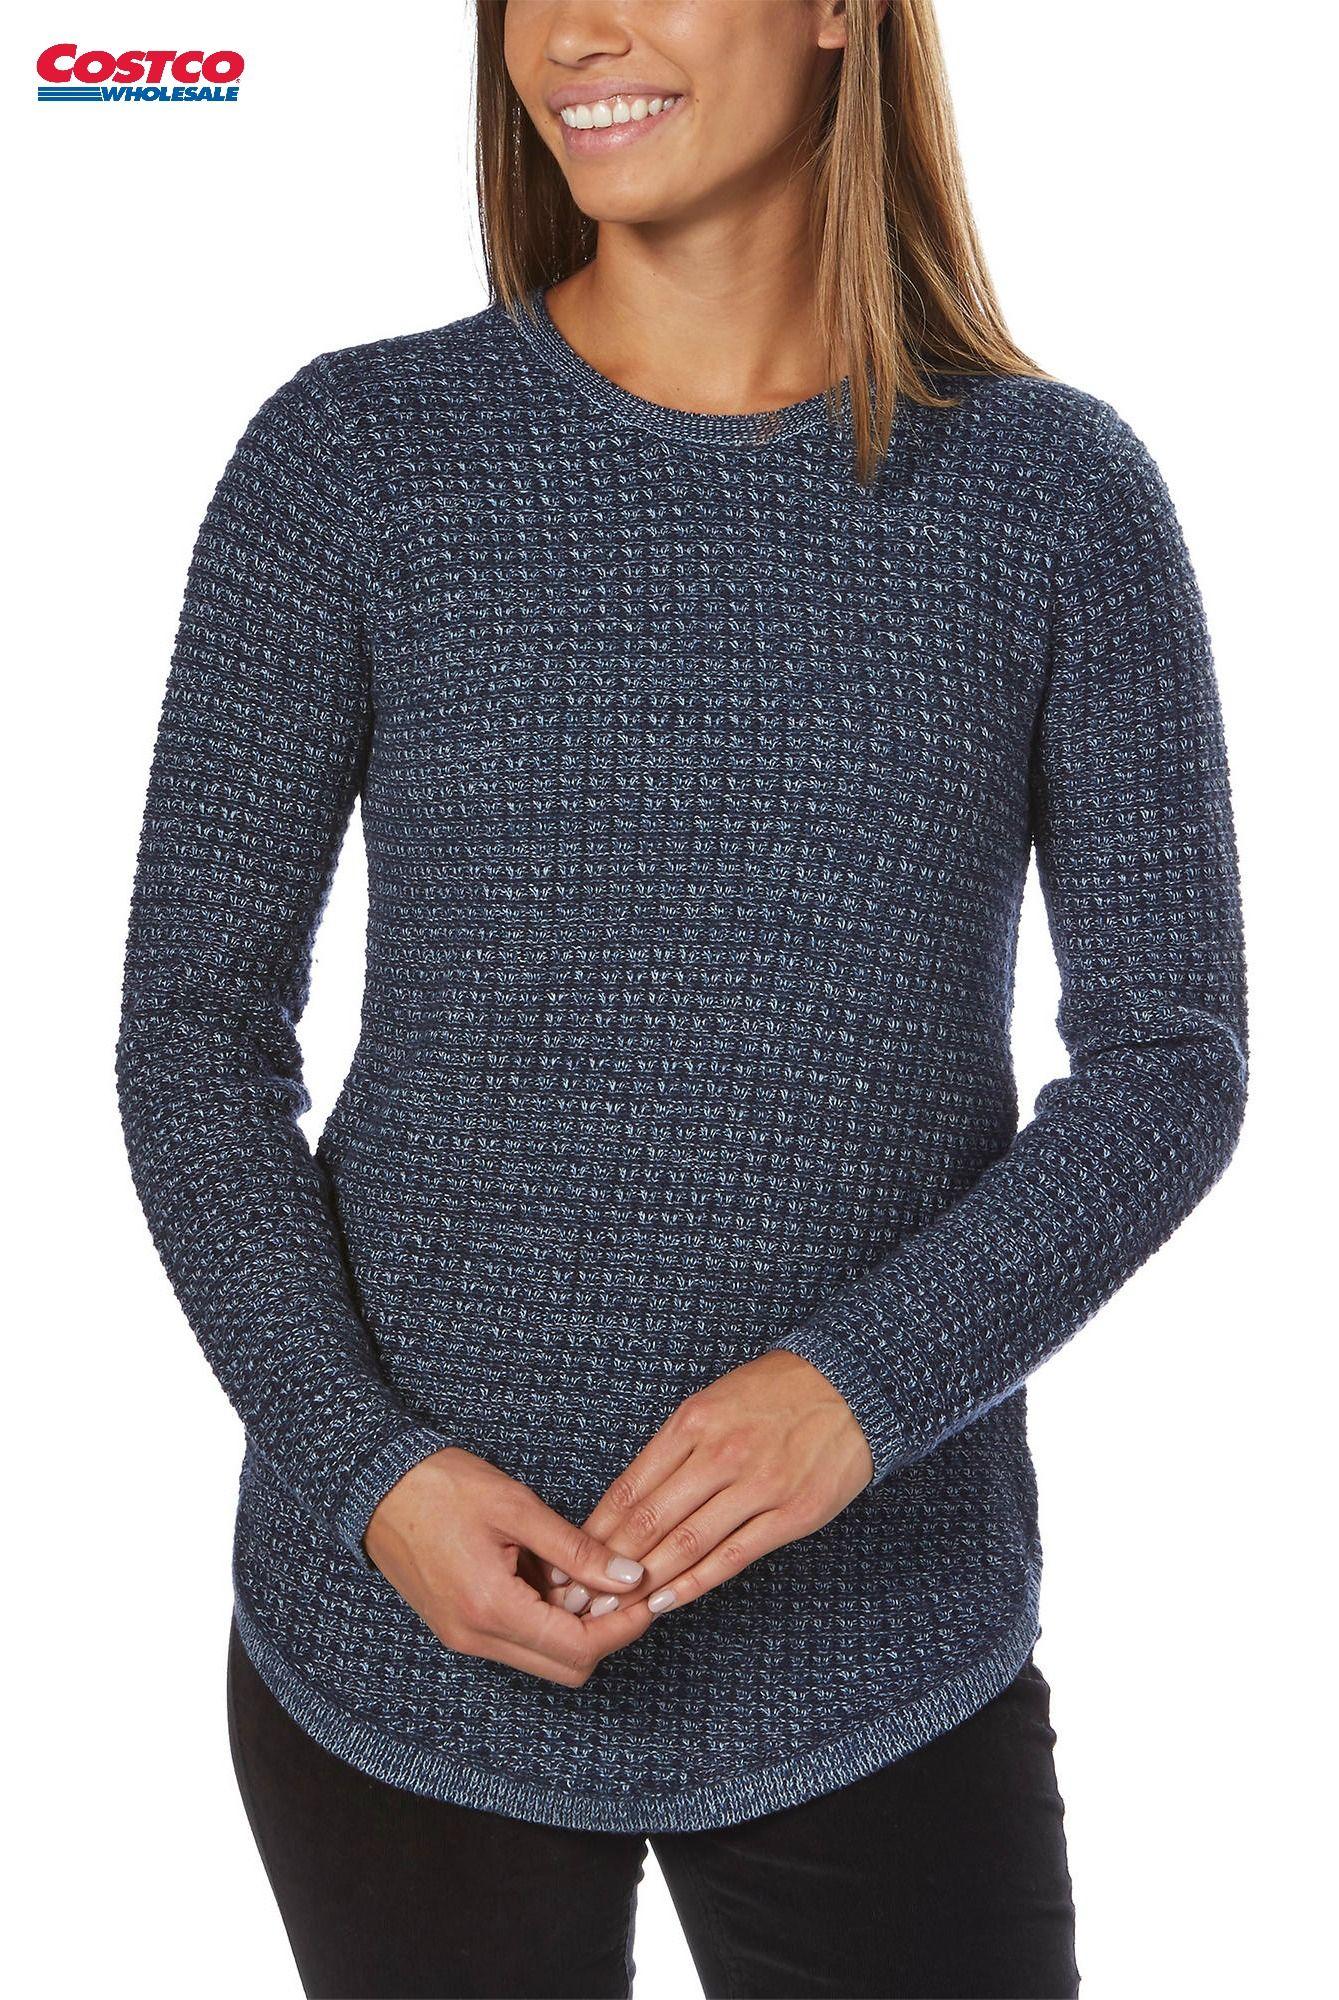 c80009fd39 Women S Fashion During The. Jeanne Pierre Ladies  Crewneck Sweater